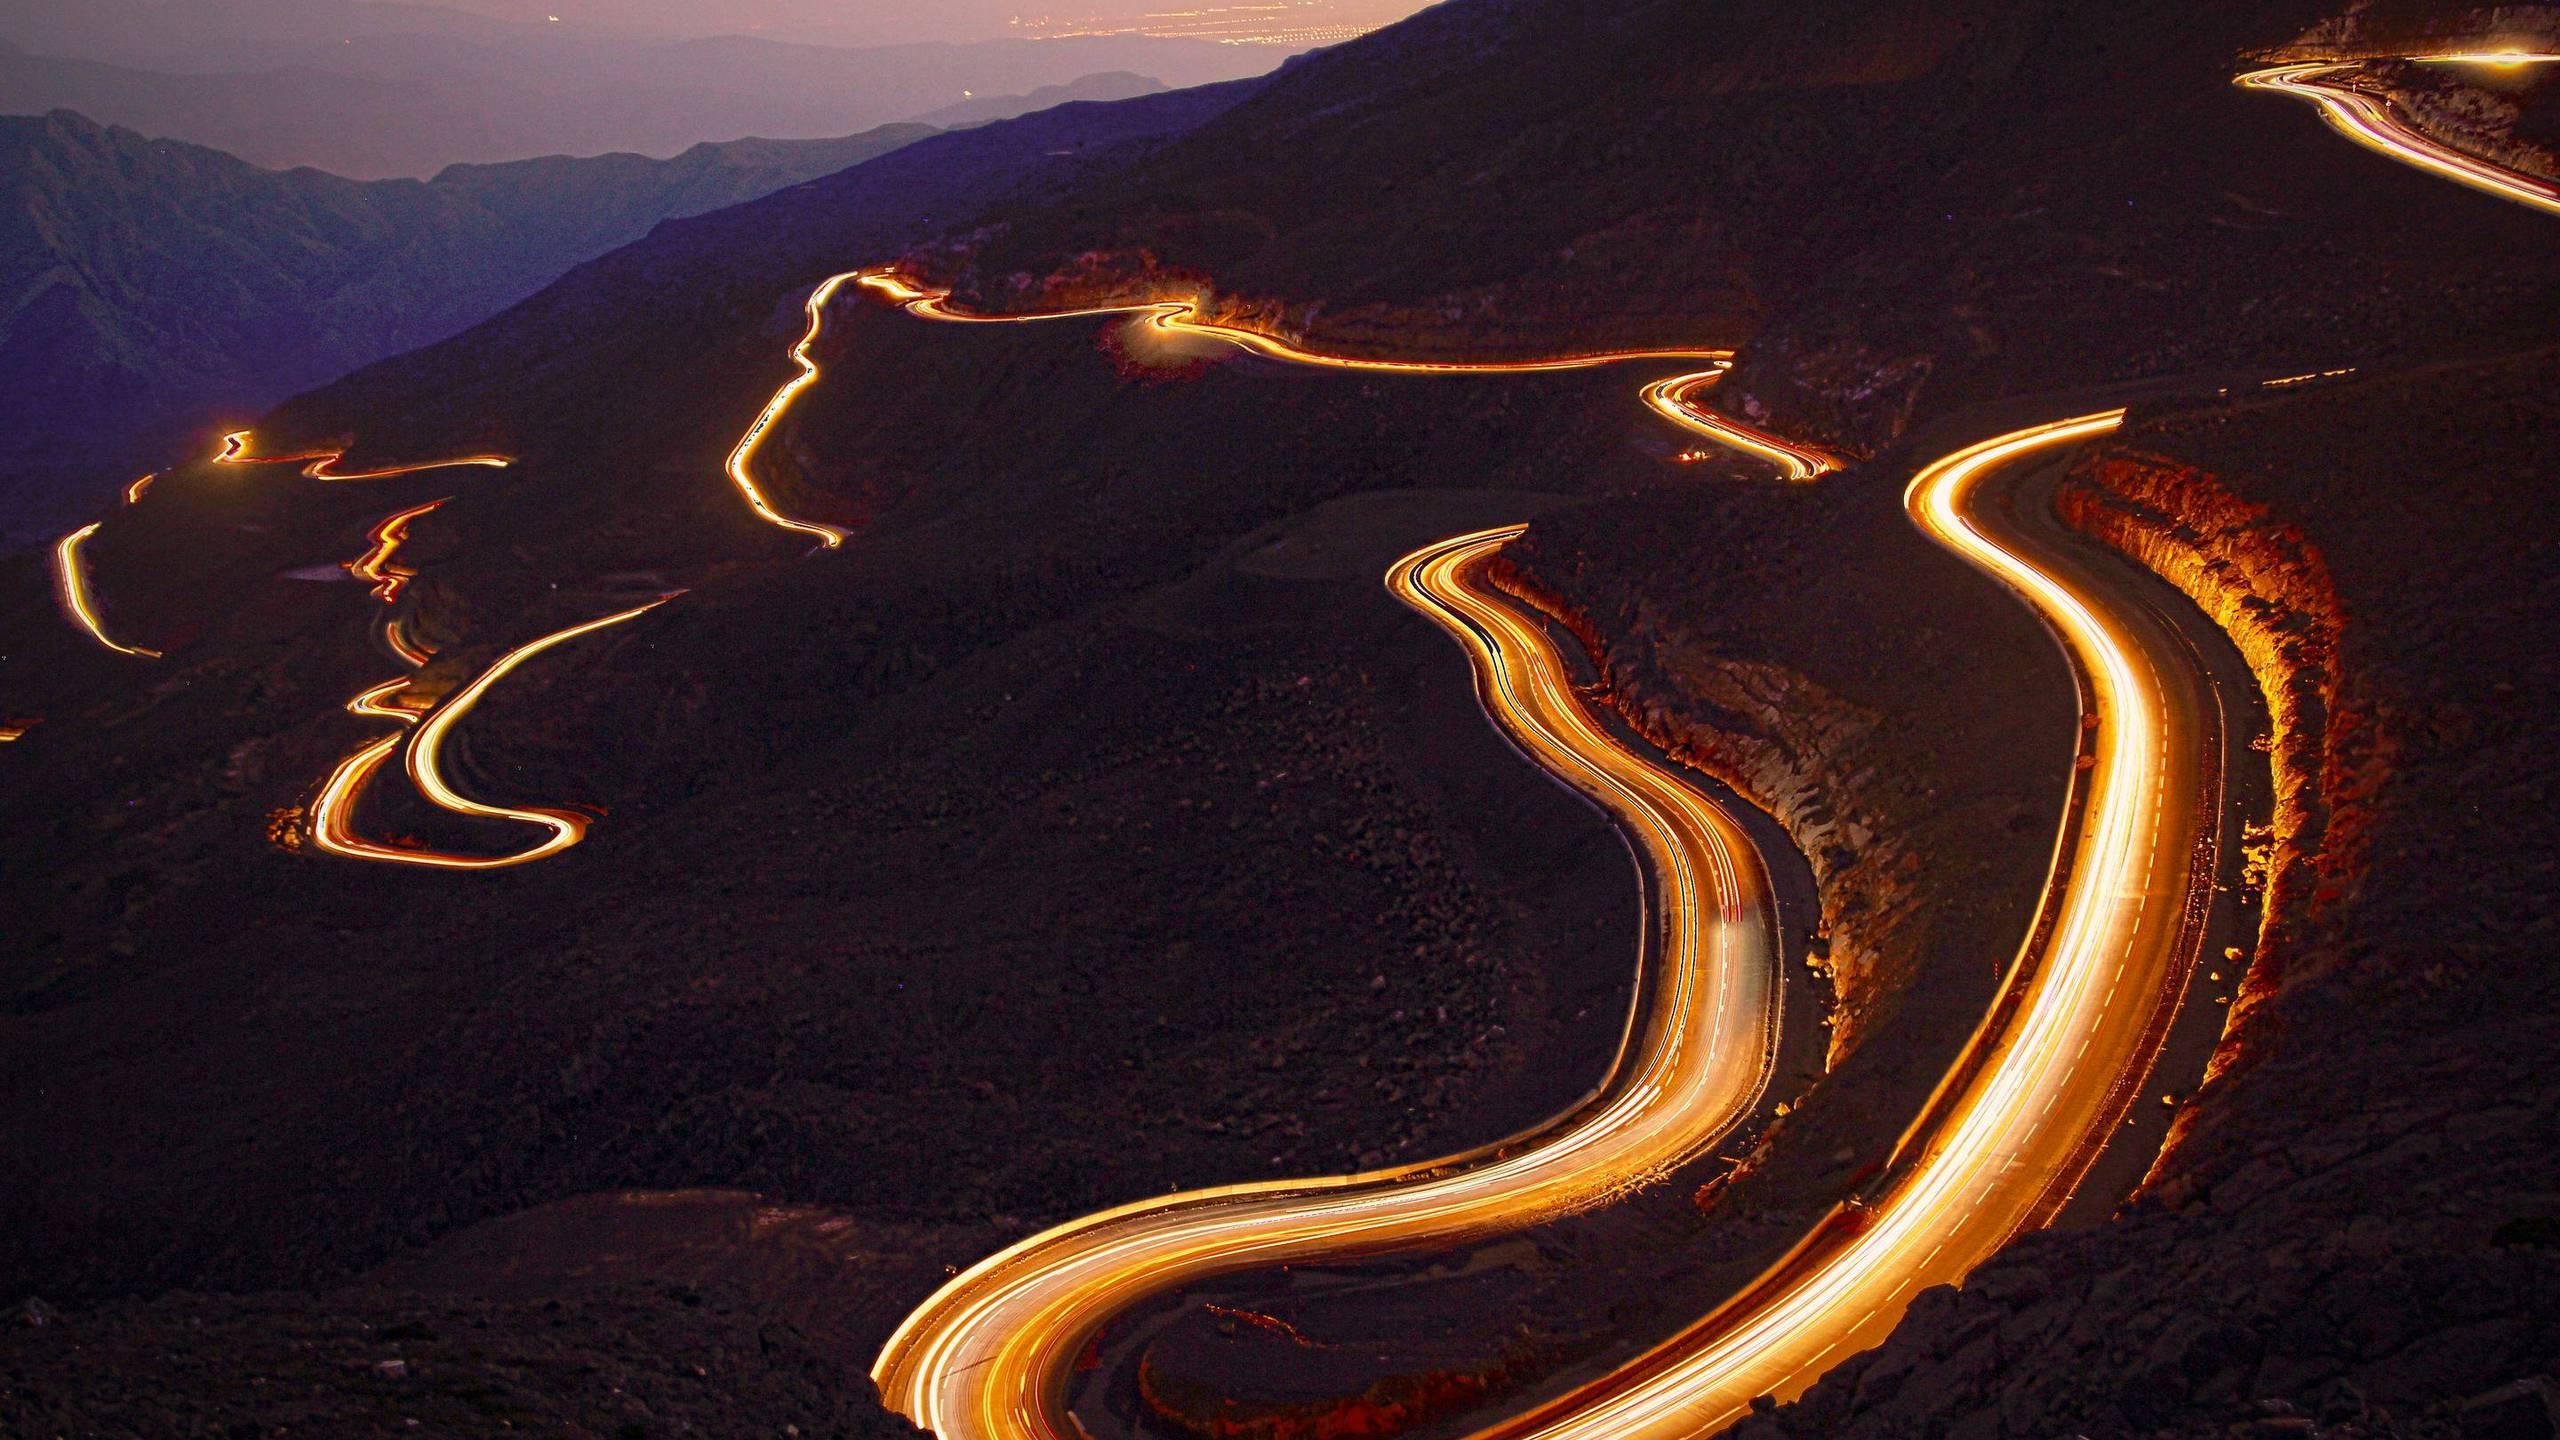 BOTPOST] Cars driving on the winding roads of Jabal Bil Ays United 2560x1440